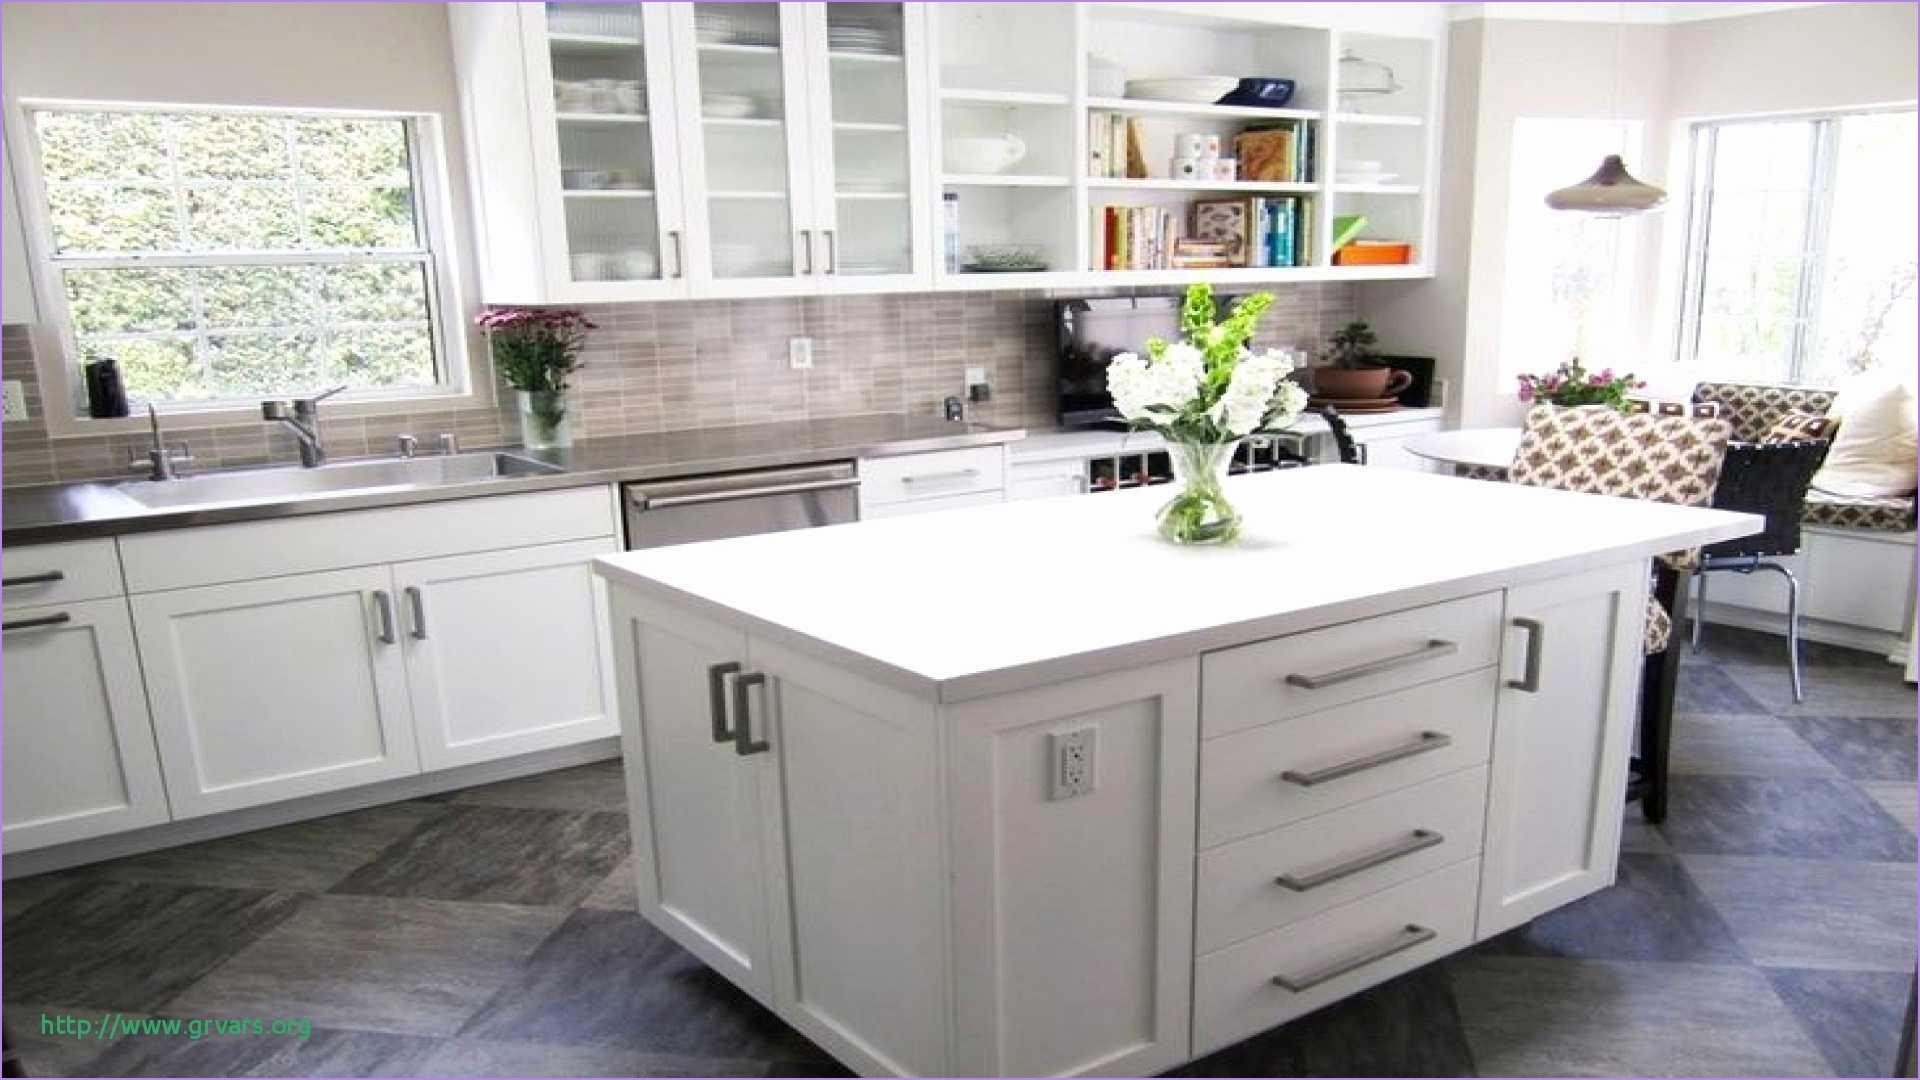 grey hardwood floors kitchen of 20 white kitchen floor tile southern living house plans pertaining to white kitchen floor tile 20 meilleur de how to wash kitchen floor